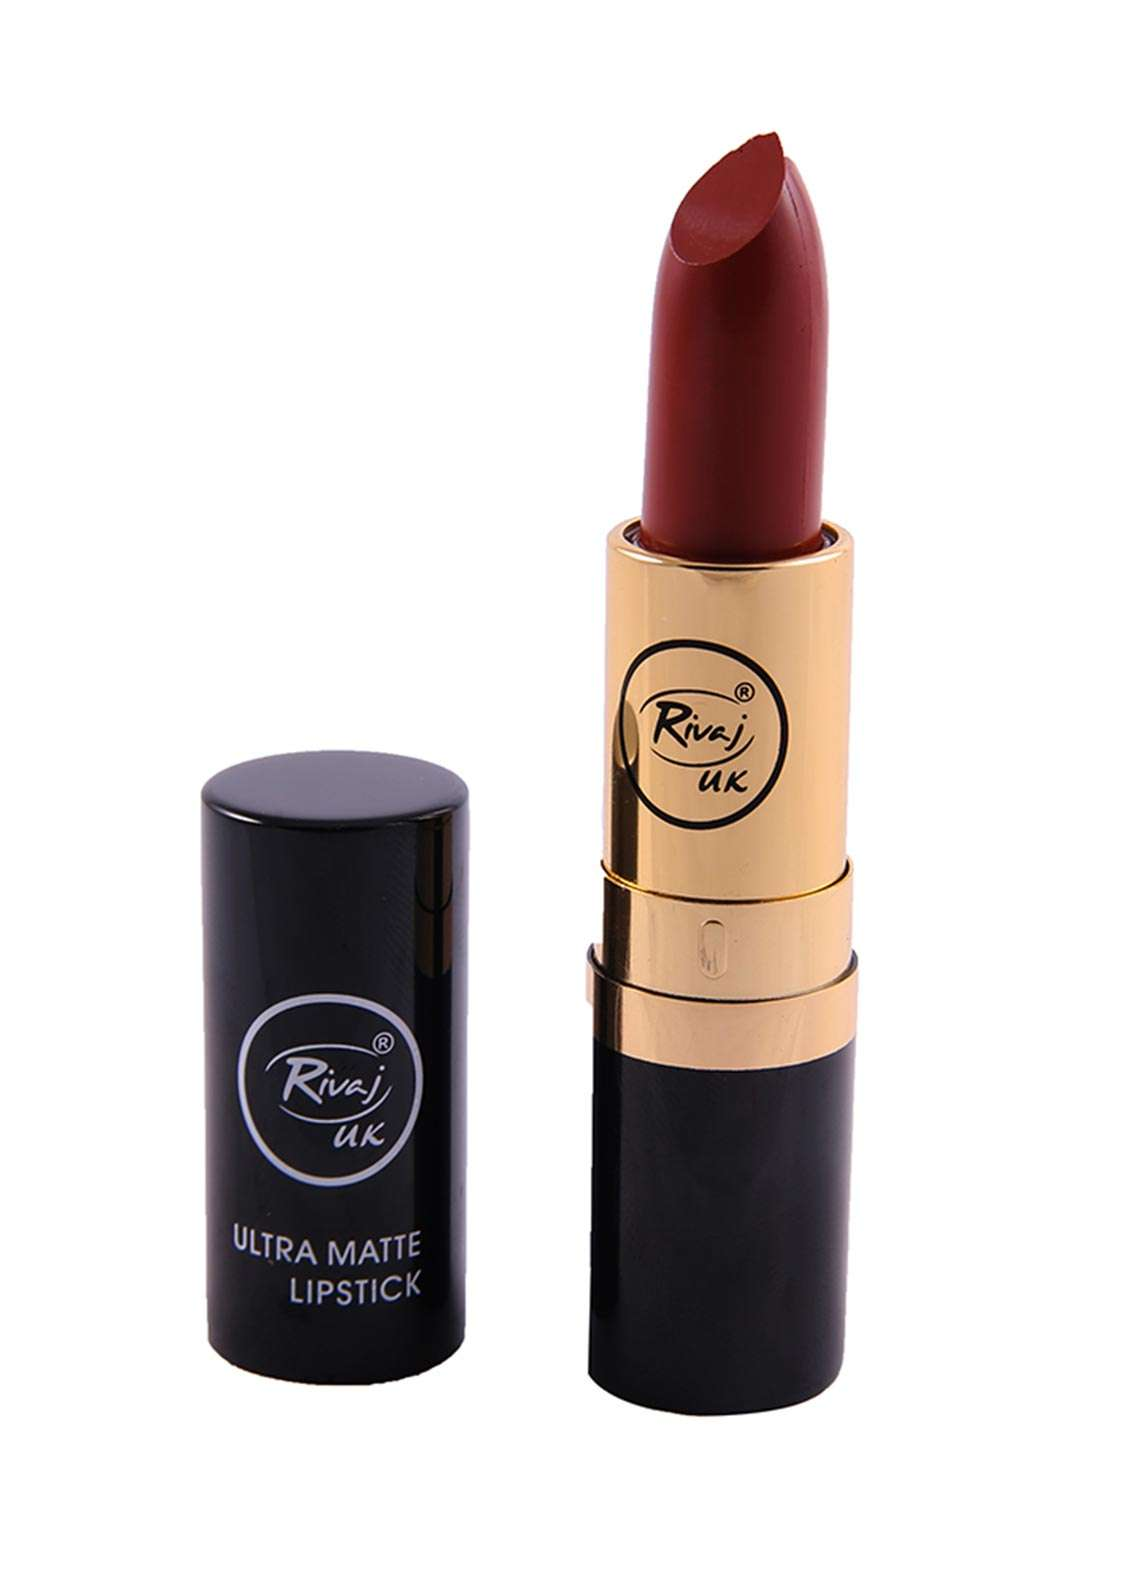 Rivaj UK Ultra Matte Lipstick - 07